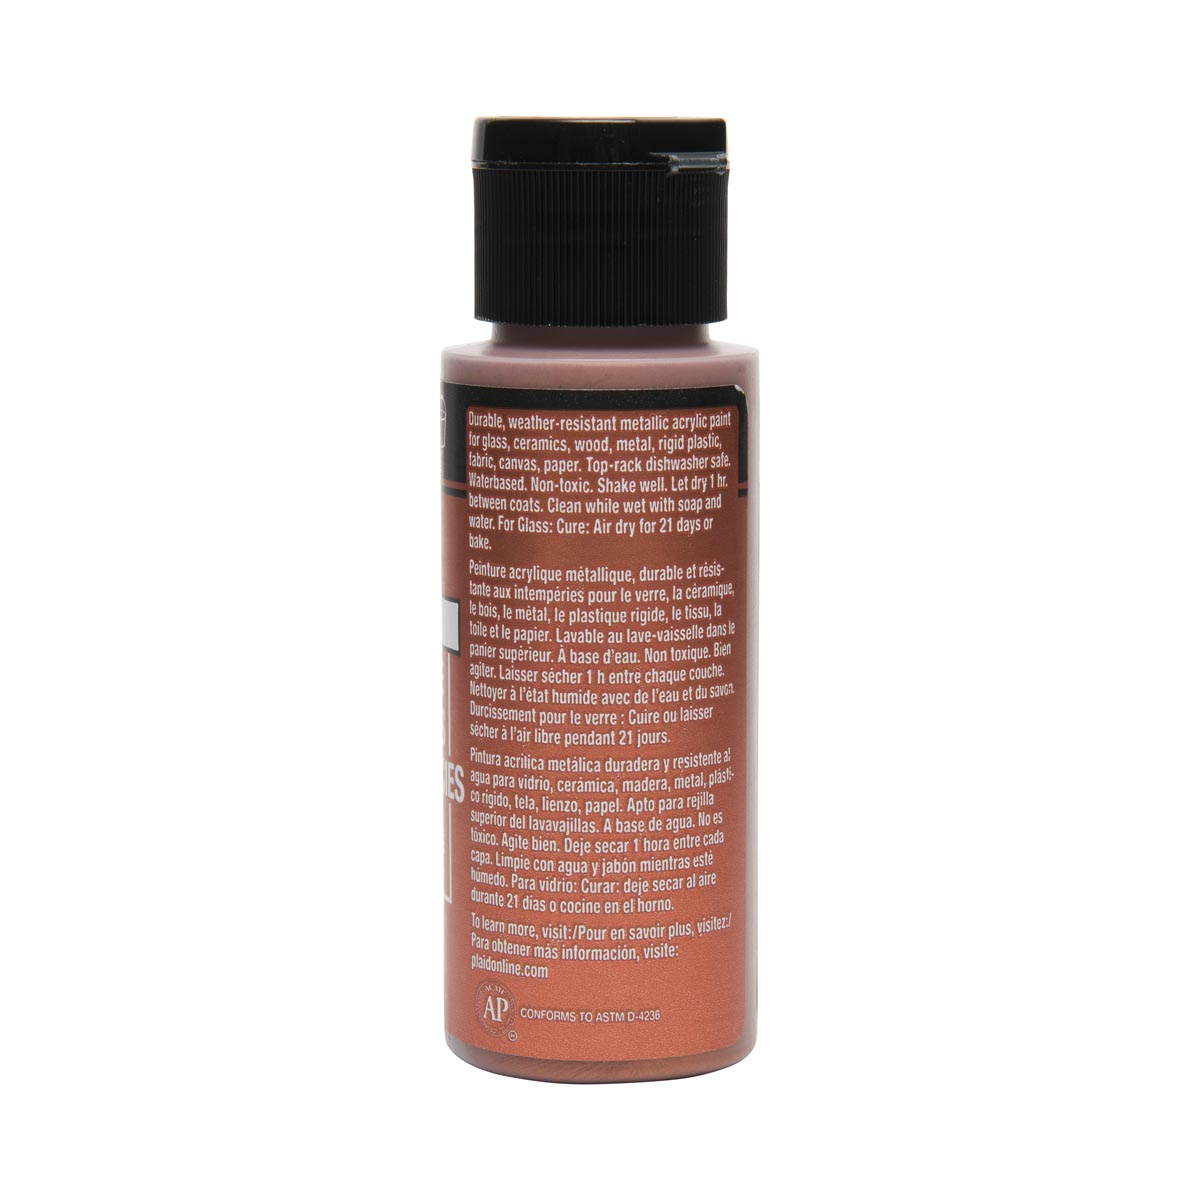 FolkArt ® Multi-Surface Metallic Acrylic Paints - Copper, 2 oz.